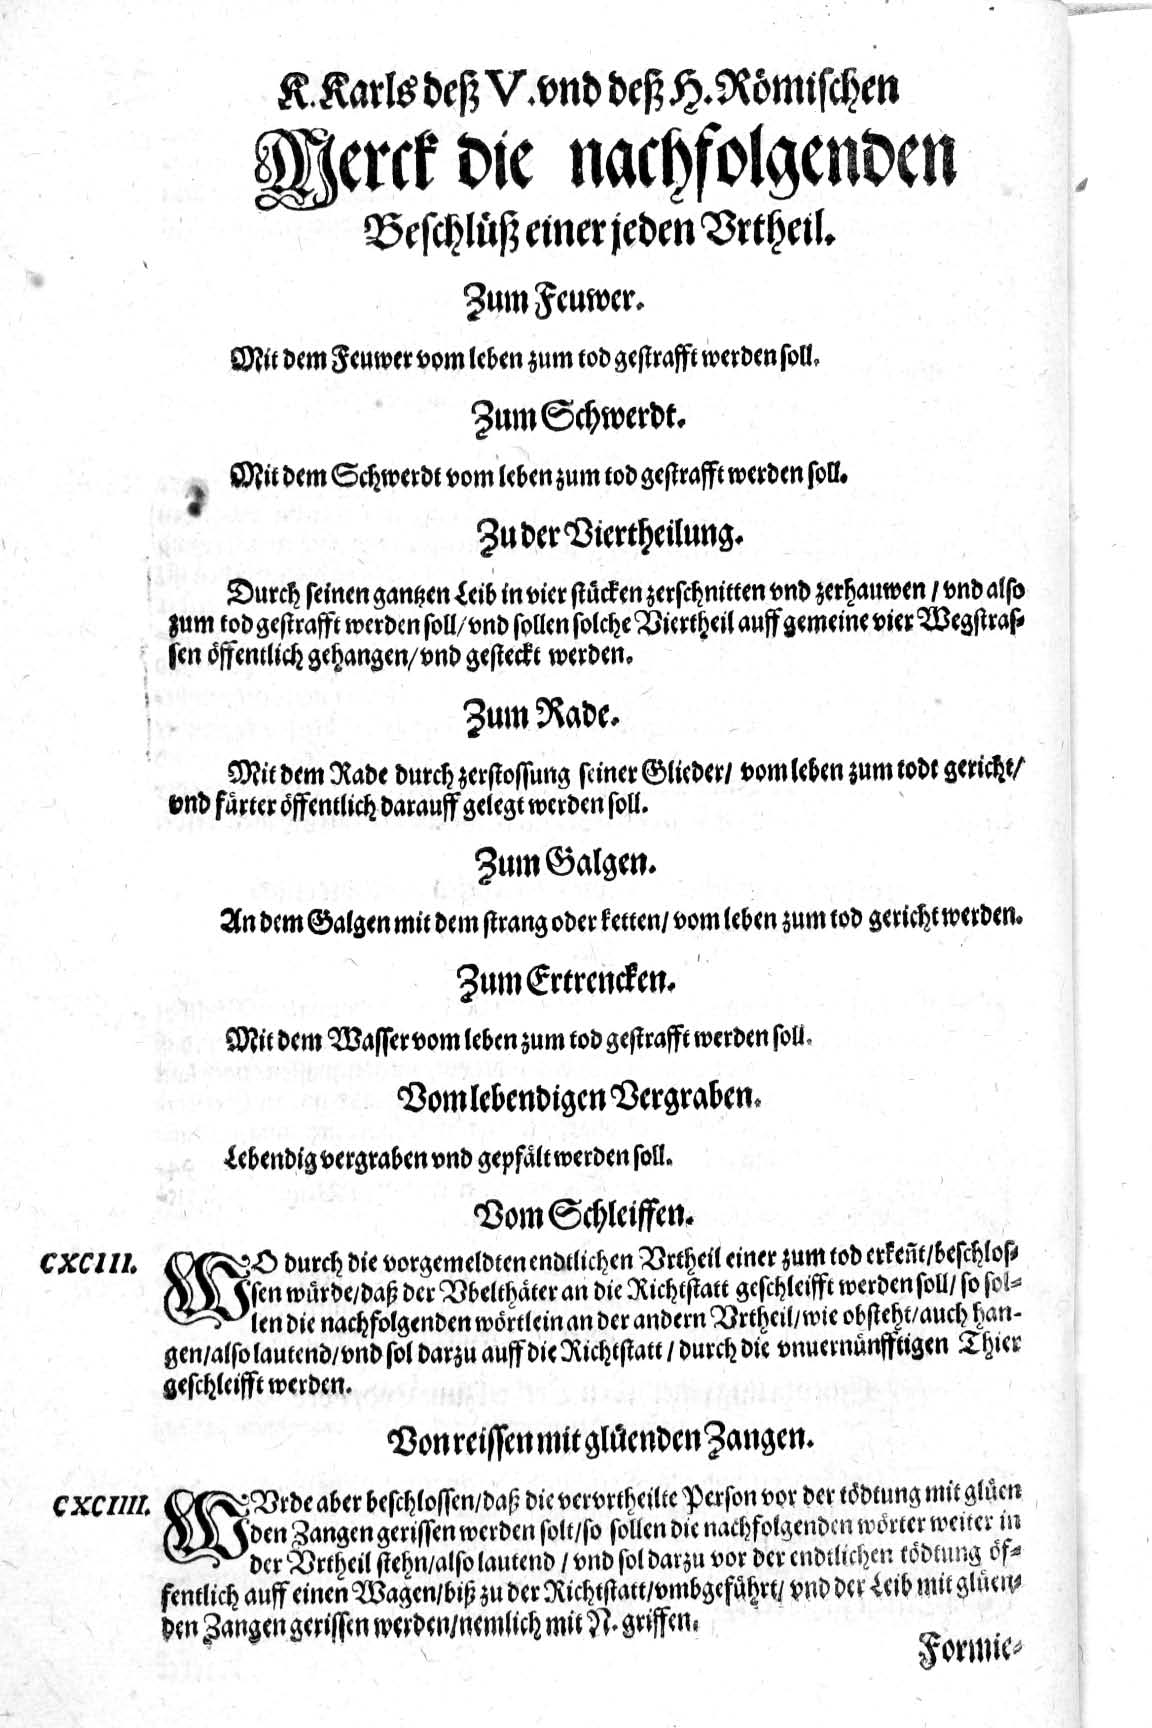 https://upload.wikimedia.org/wikipedia/commons/f/fb/De_Constitutio_criminalis_Carolina_%281577%29_60.jpg